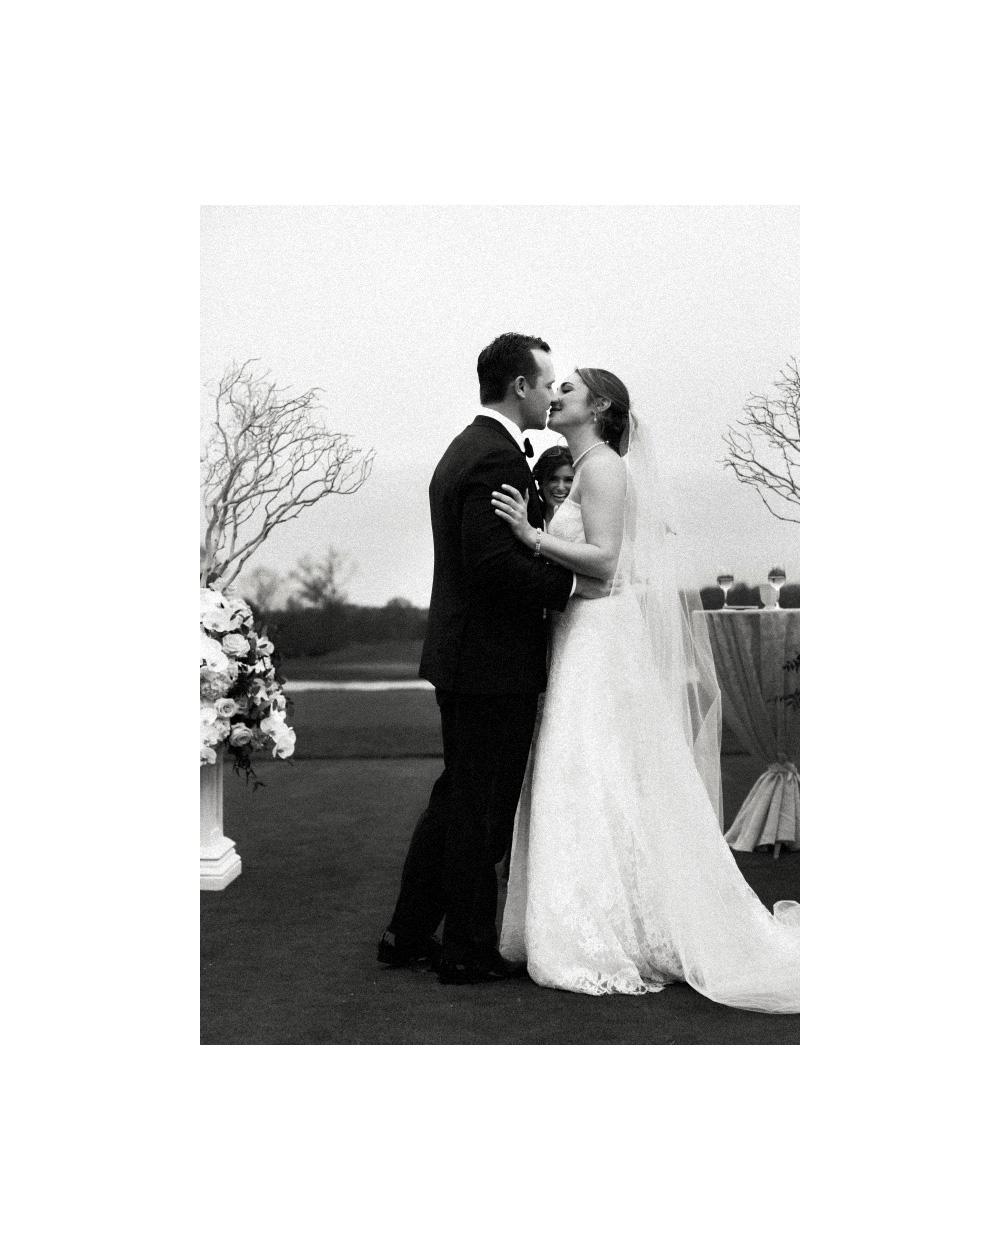 AhmetZe_Bedminster_Wedding_033.jpg